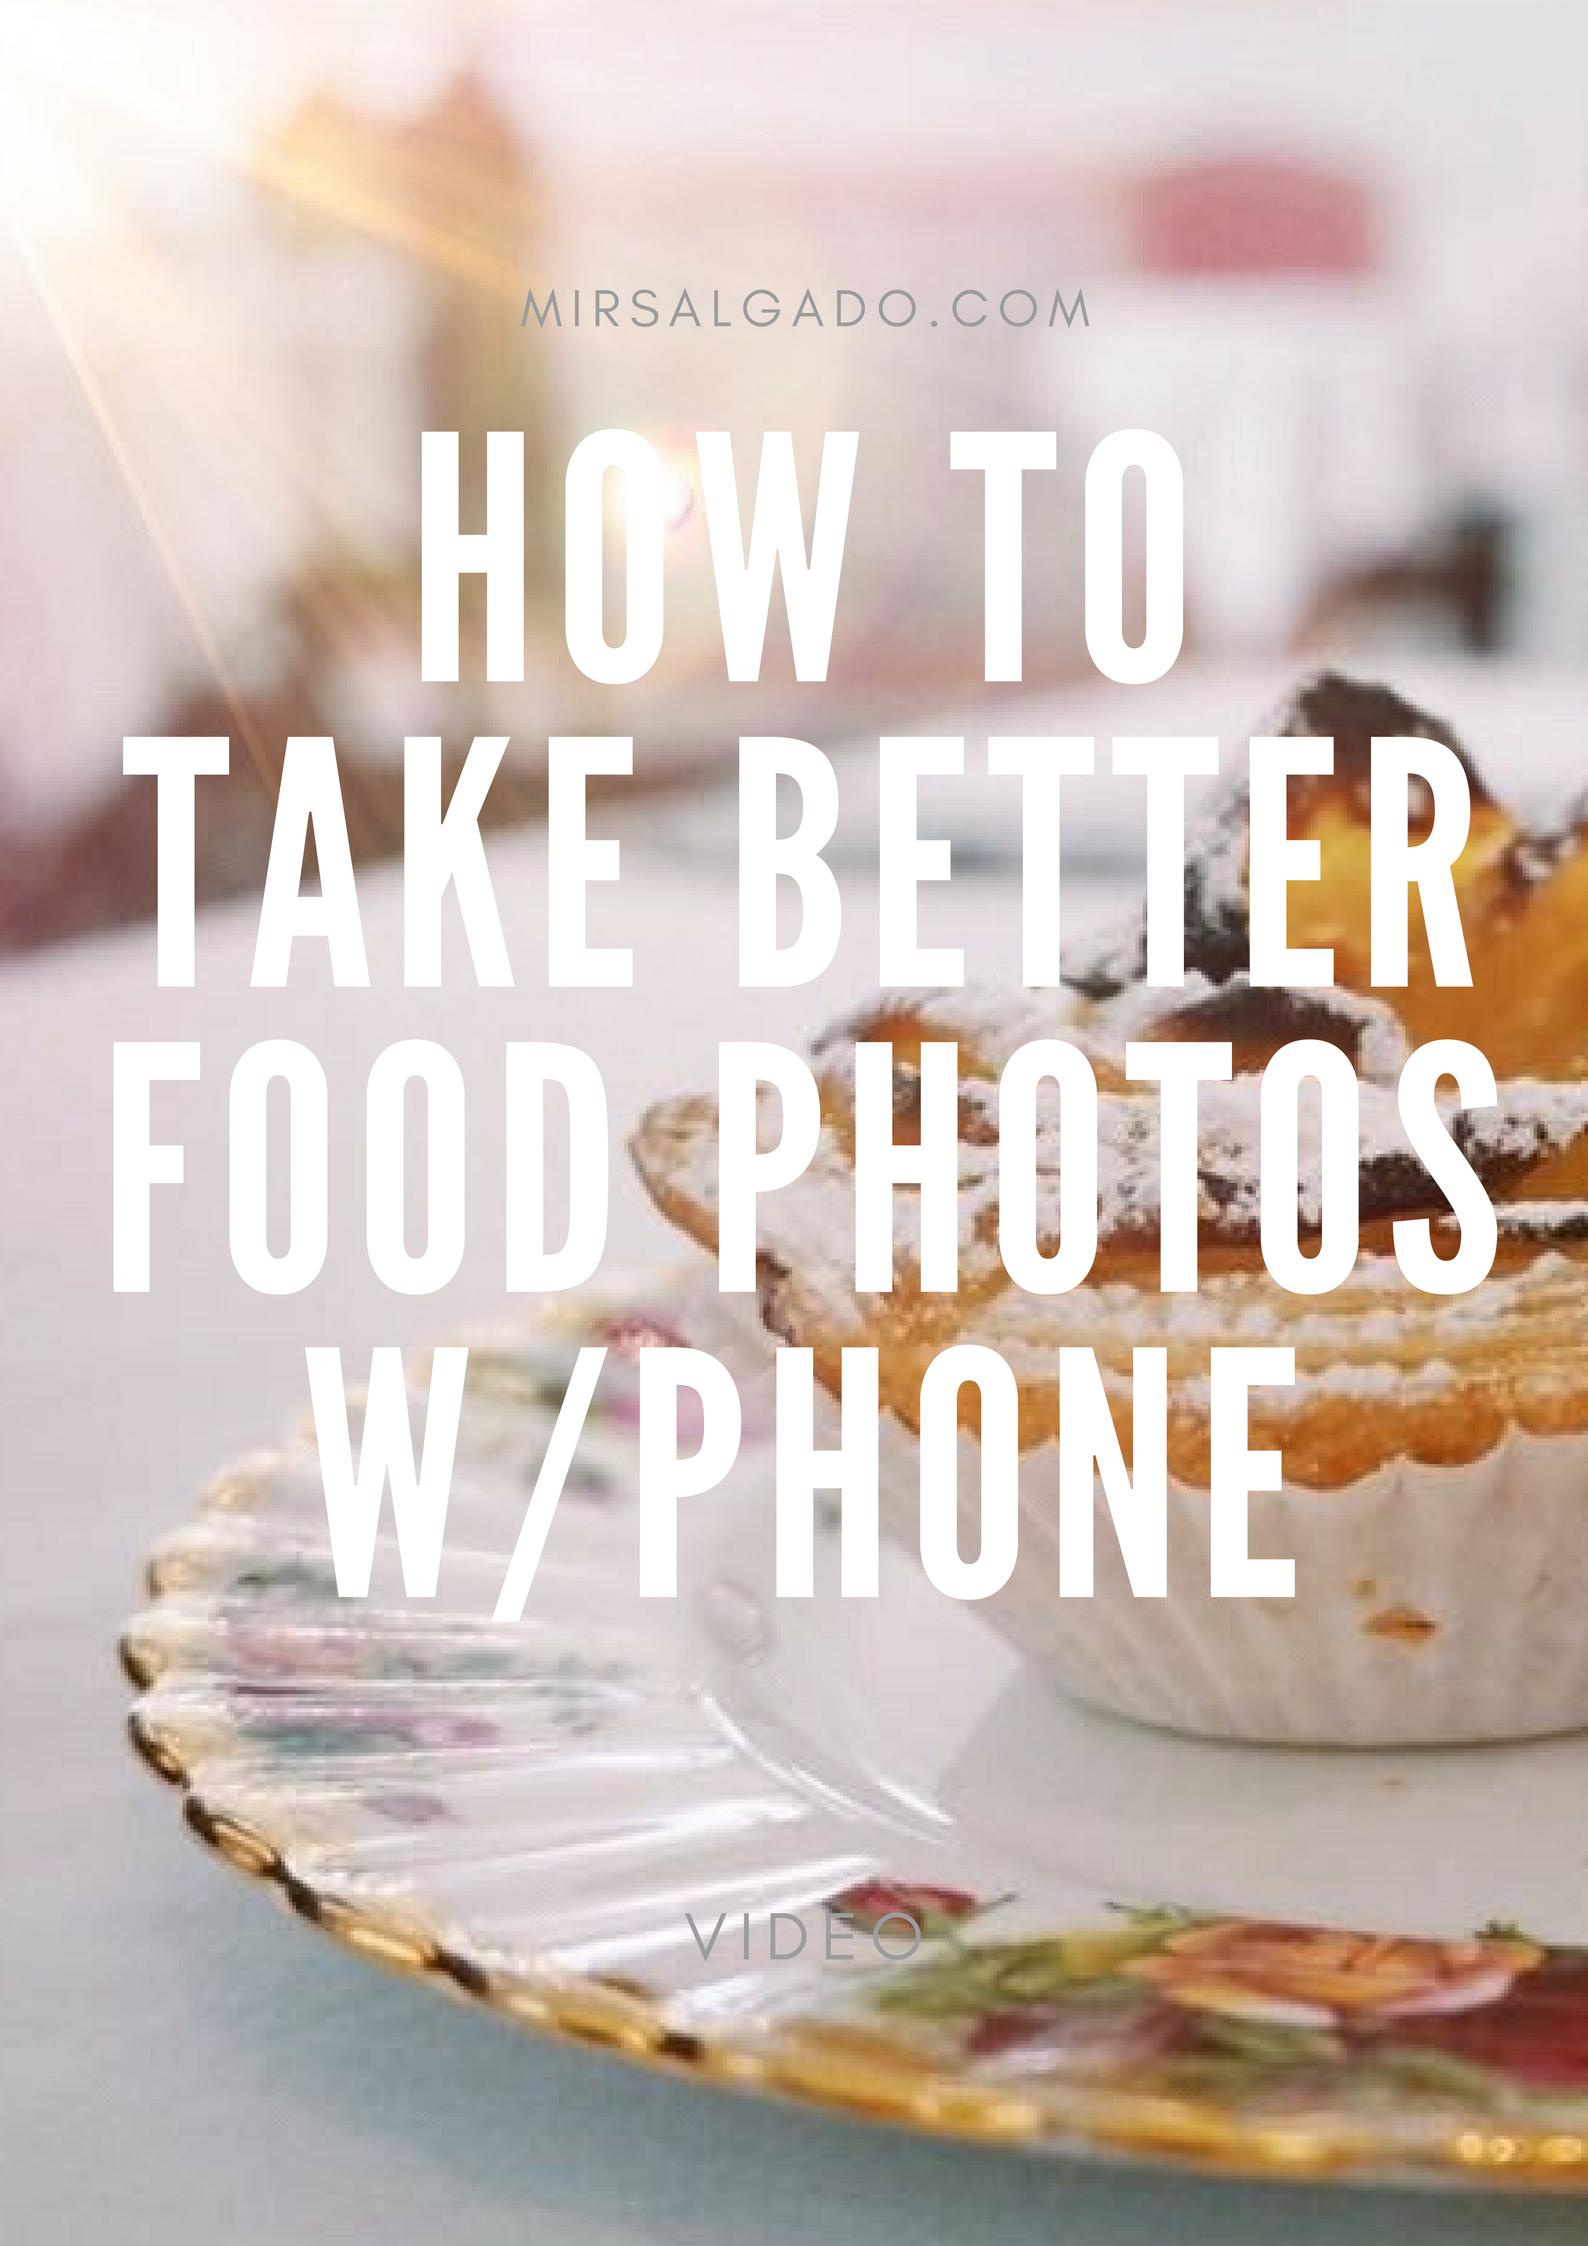 How-to-take-better-photos, tips-photos